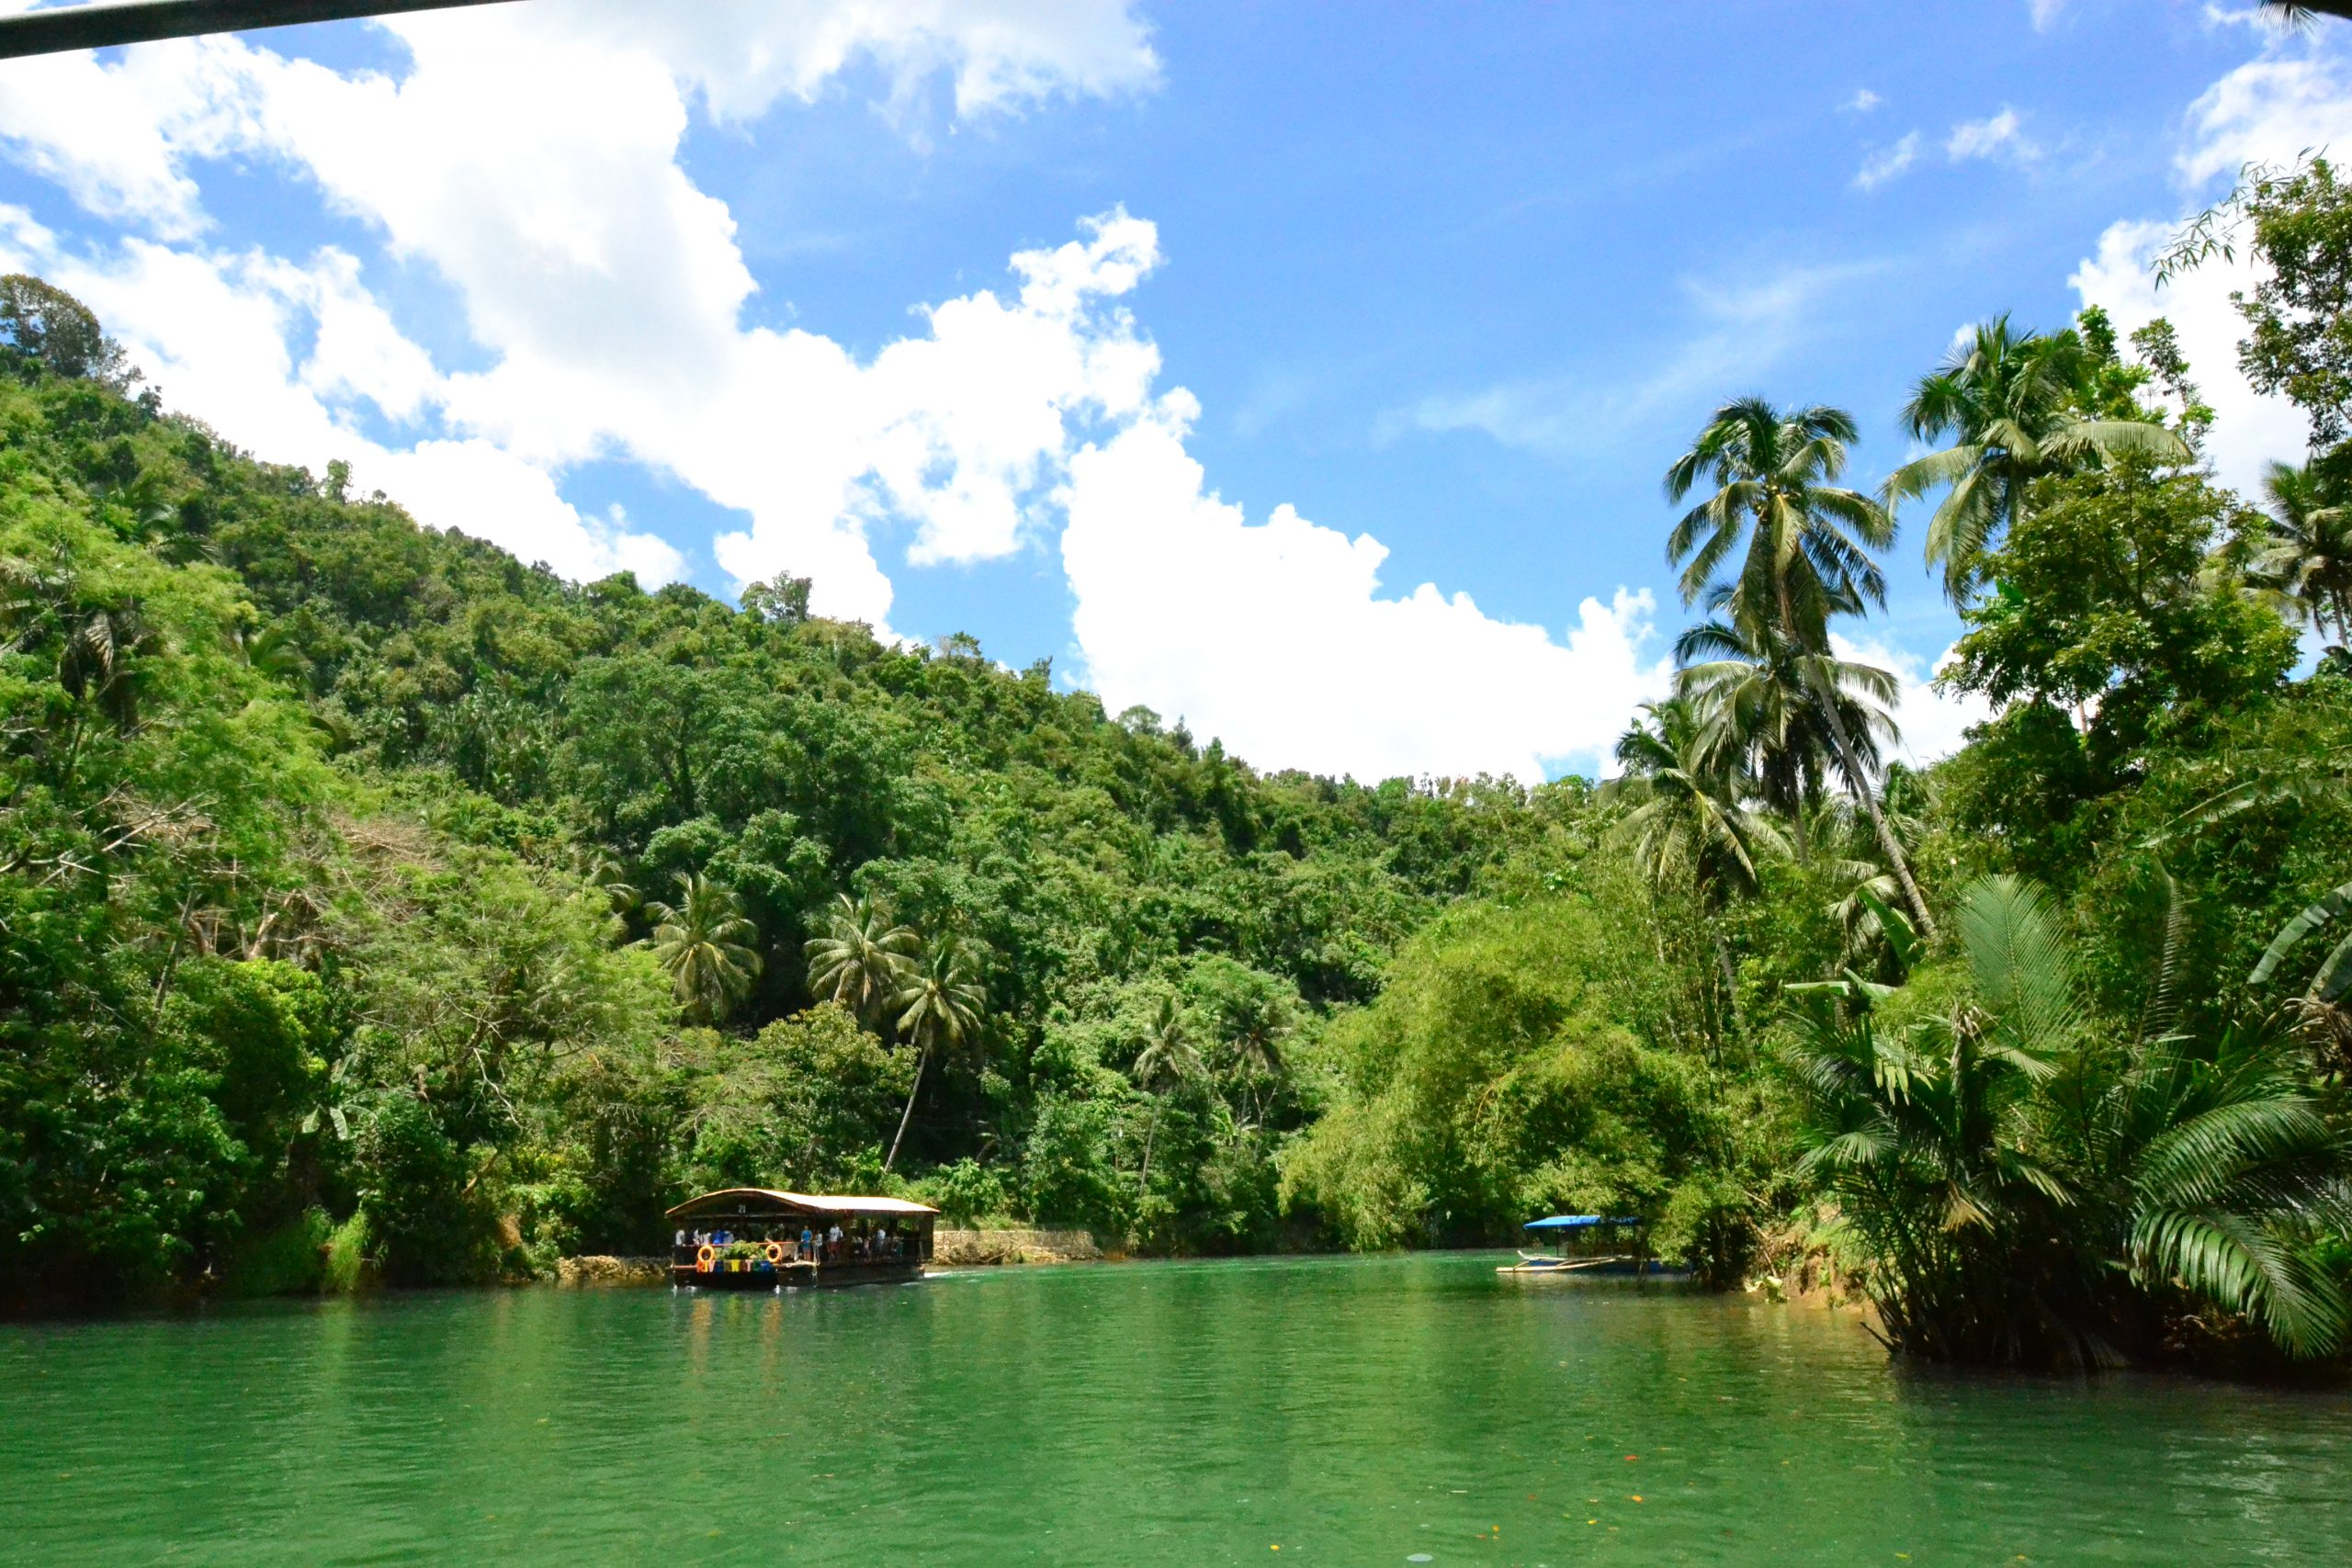 Surround Yourself With Lush Greenery Around the Manjeera Reservoir